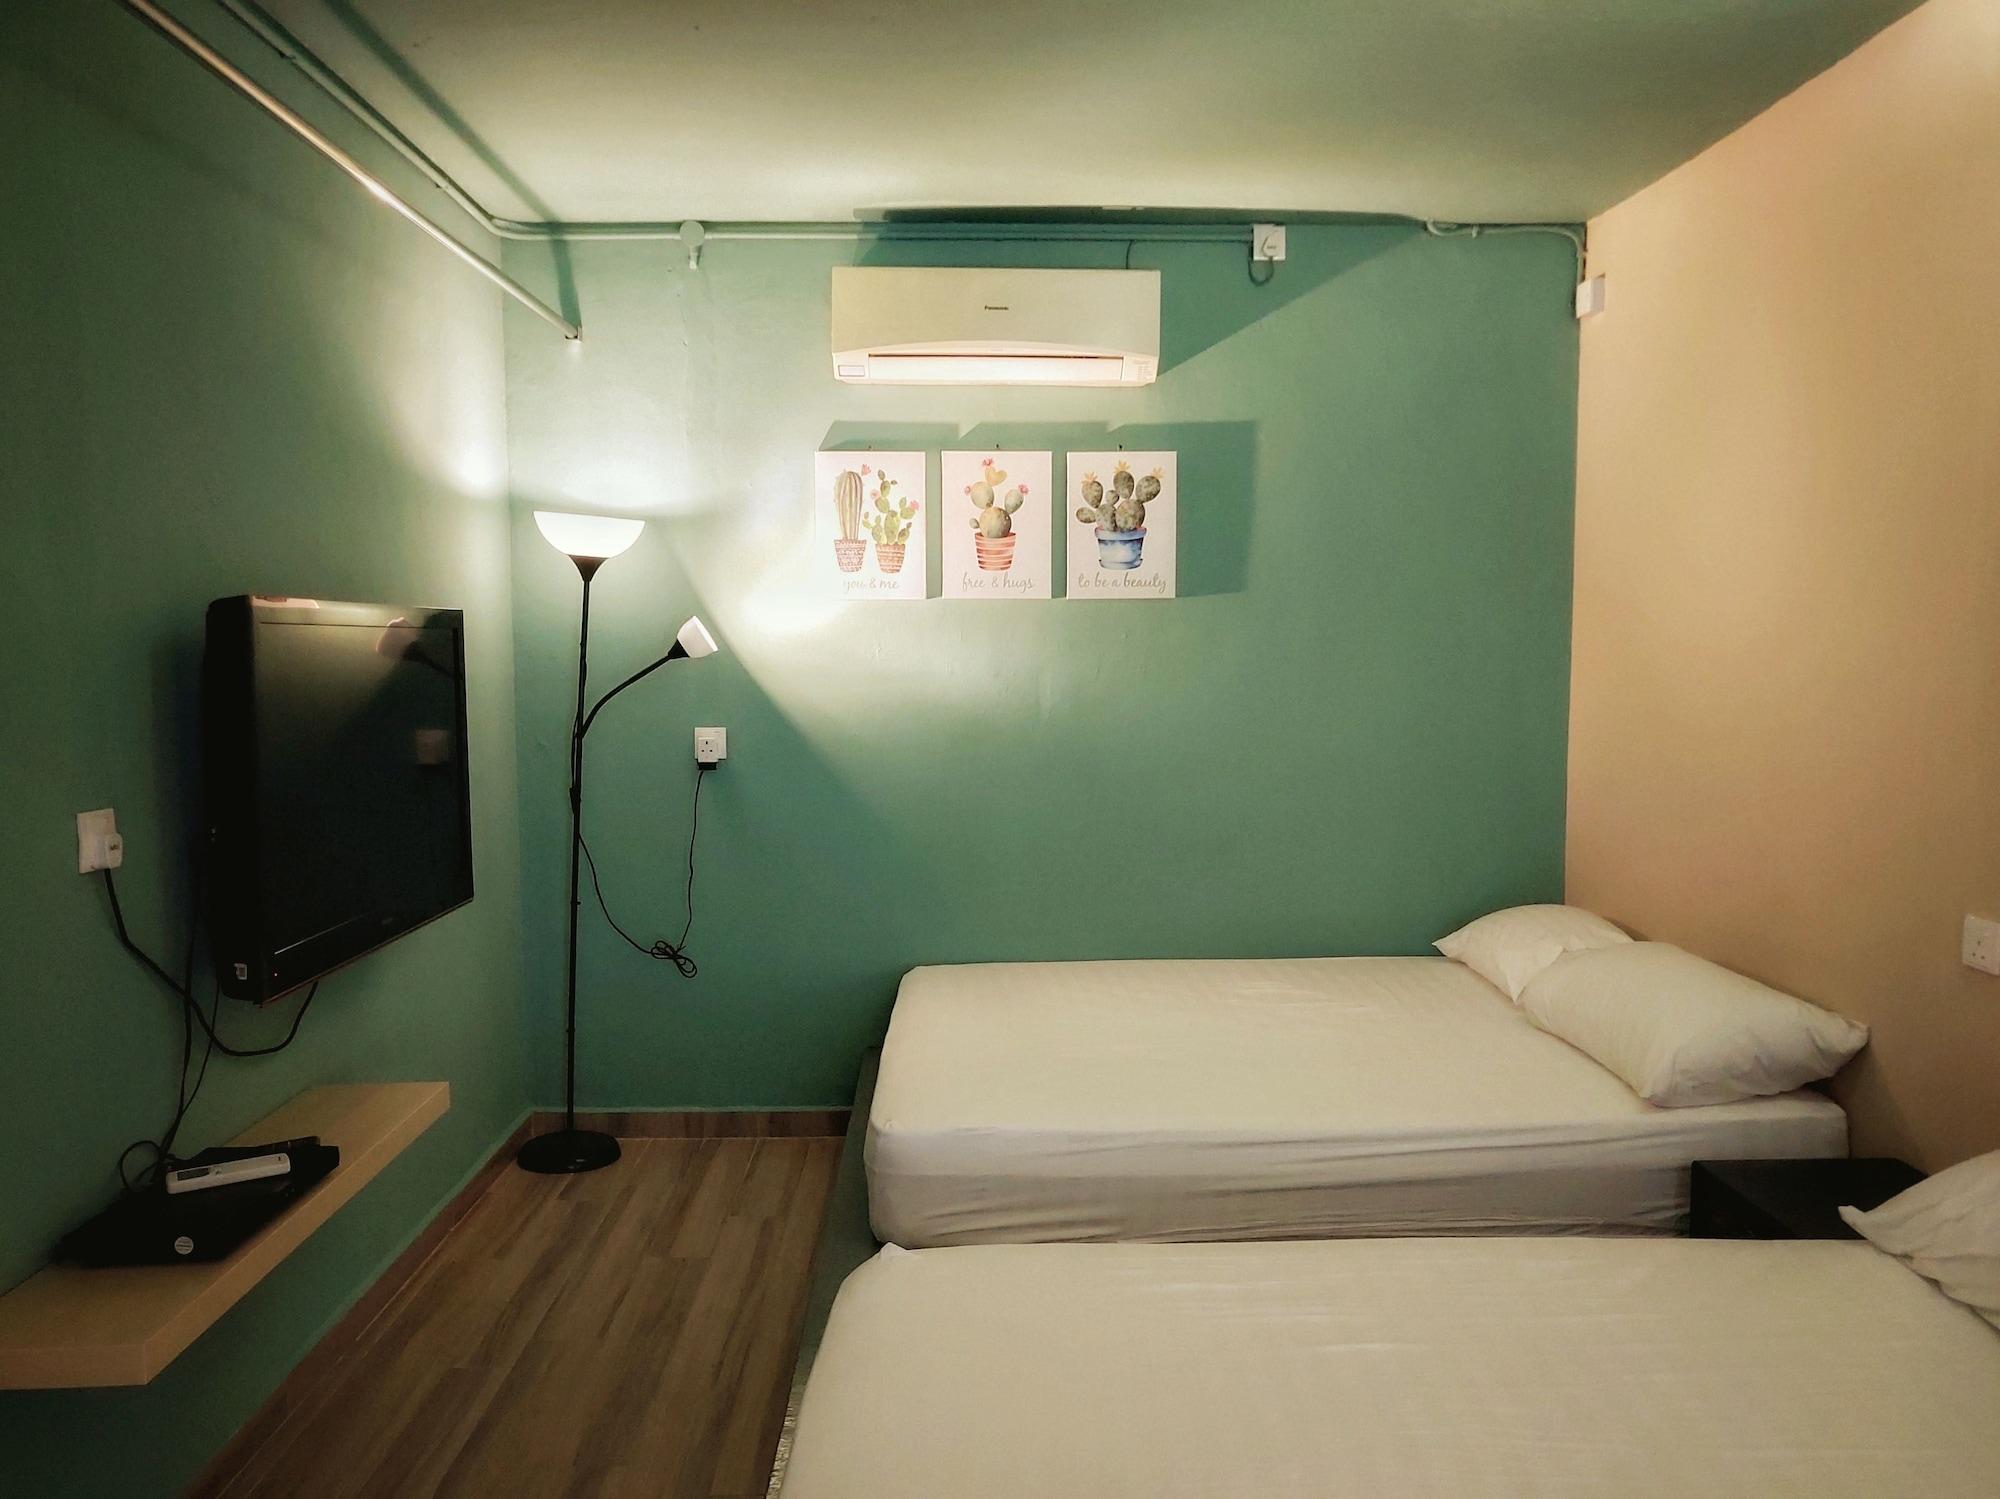 Beds In Garden Hostel Sdn Bhd, Kinta